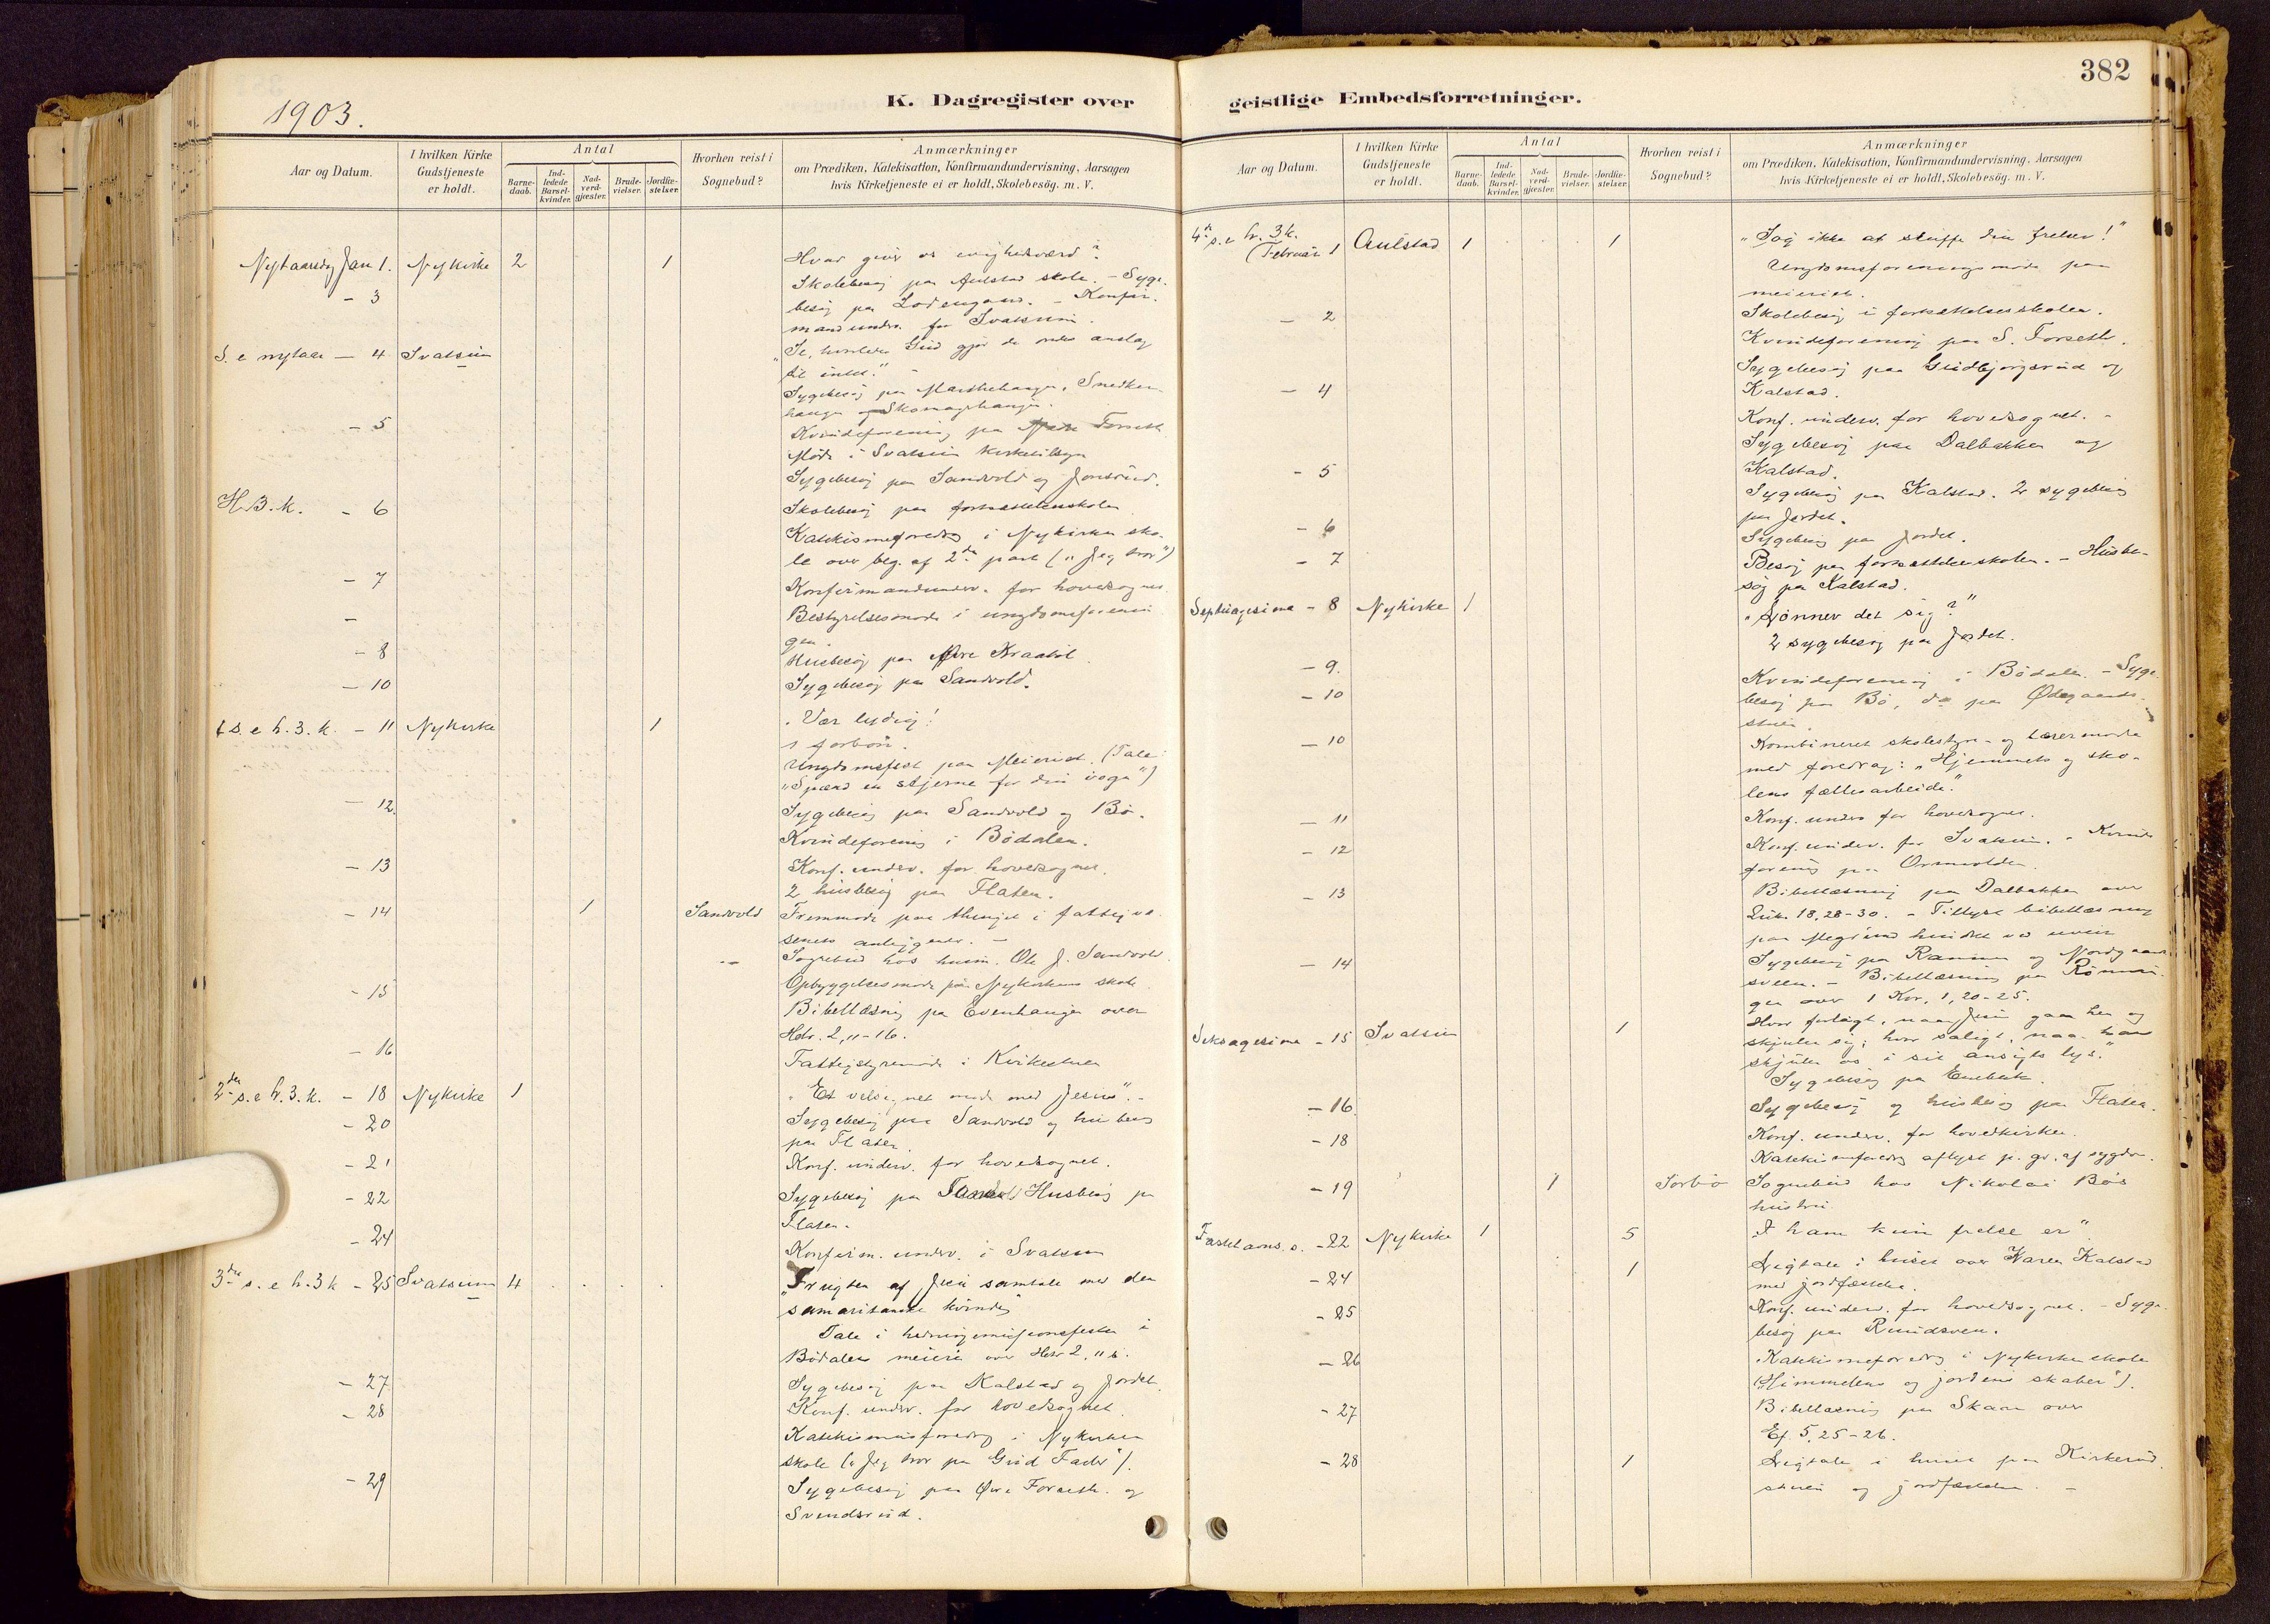 SAH, Vestre Gausdal prestekontor, Ministerialbok nr. 1, 1887-1914, s. 382